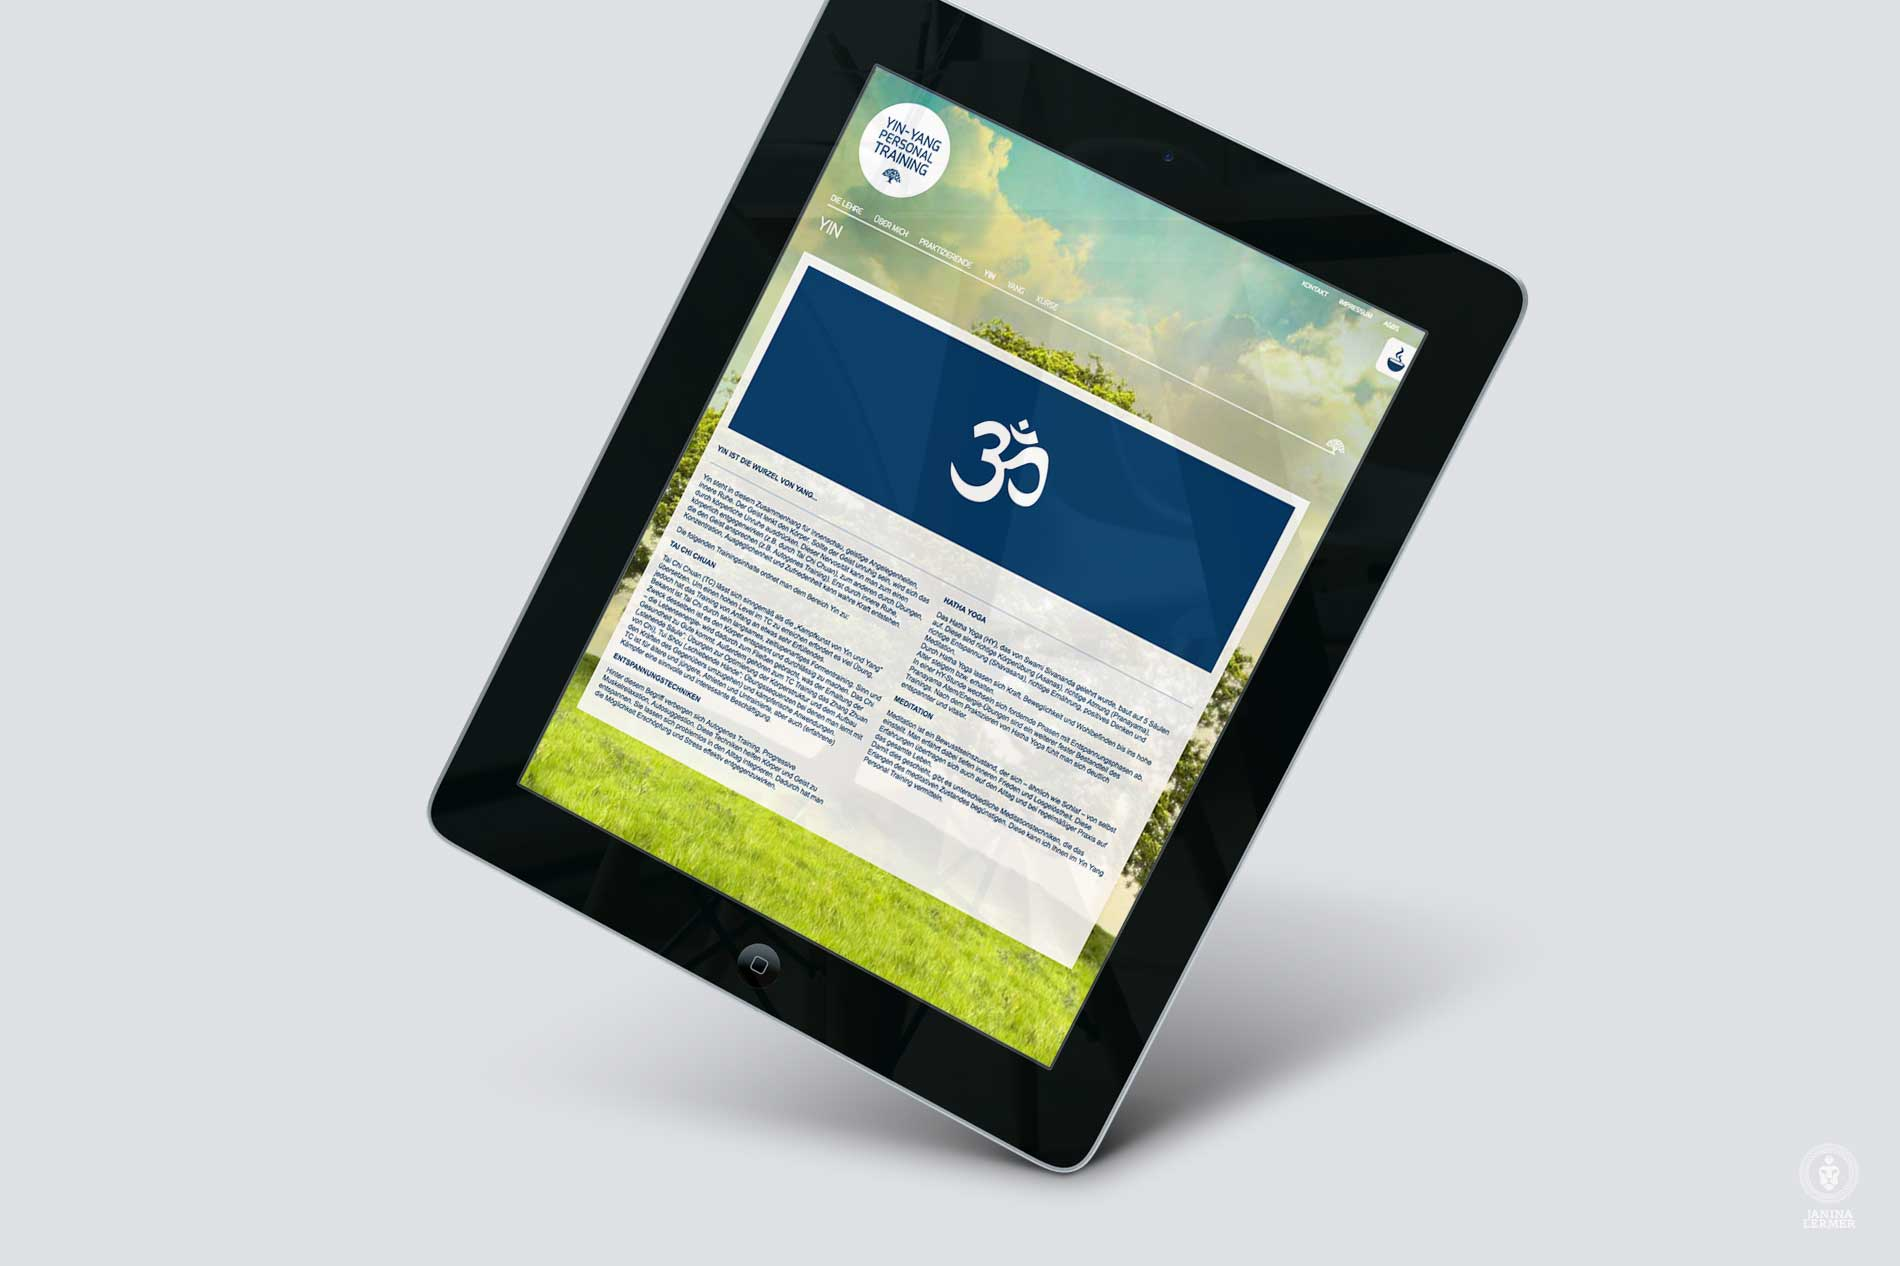 Webseitenkonzept-Webseitengestaltung-Webdesign-Yin-Yang-PersonalTrainer-Ulrich-Lampert-Ipad-YIN